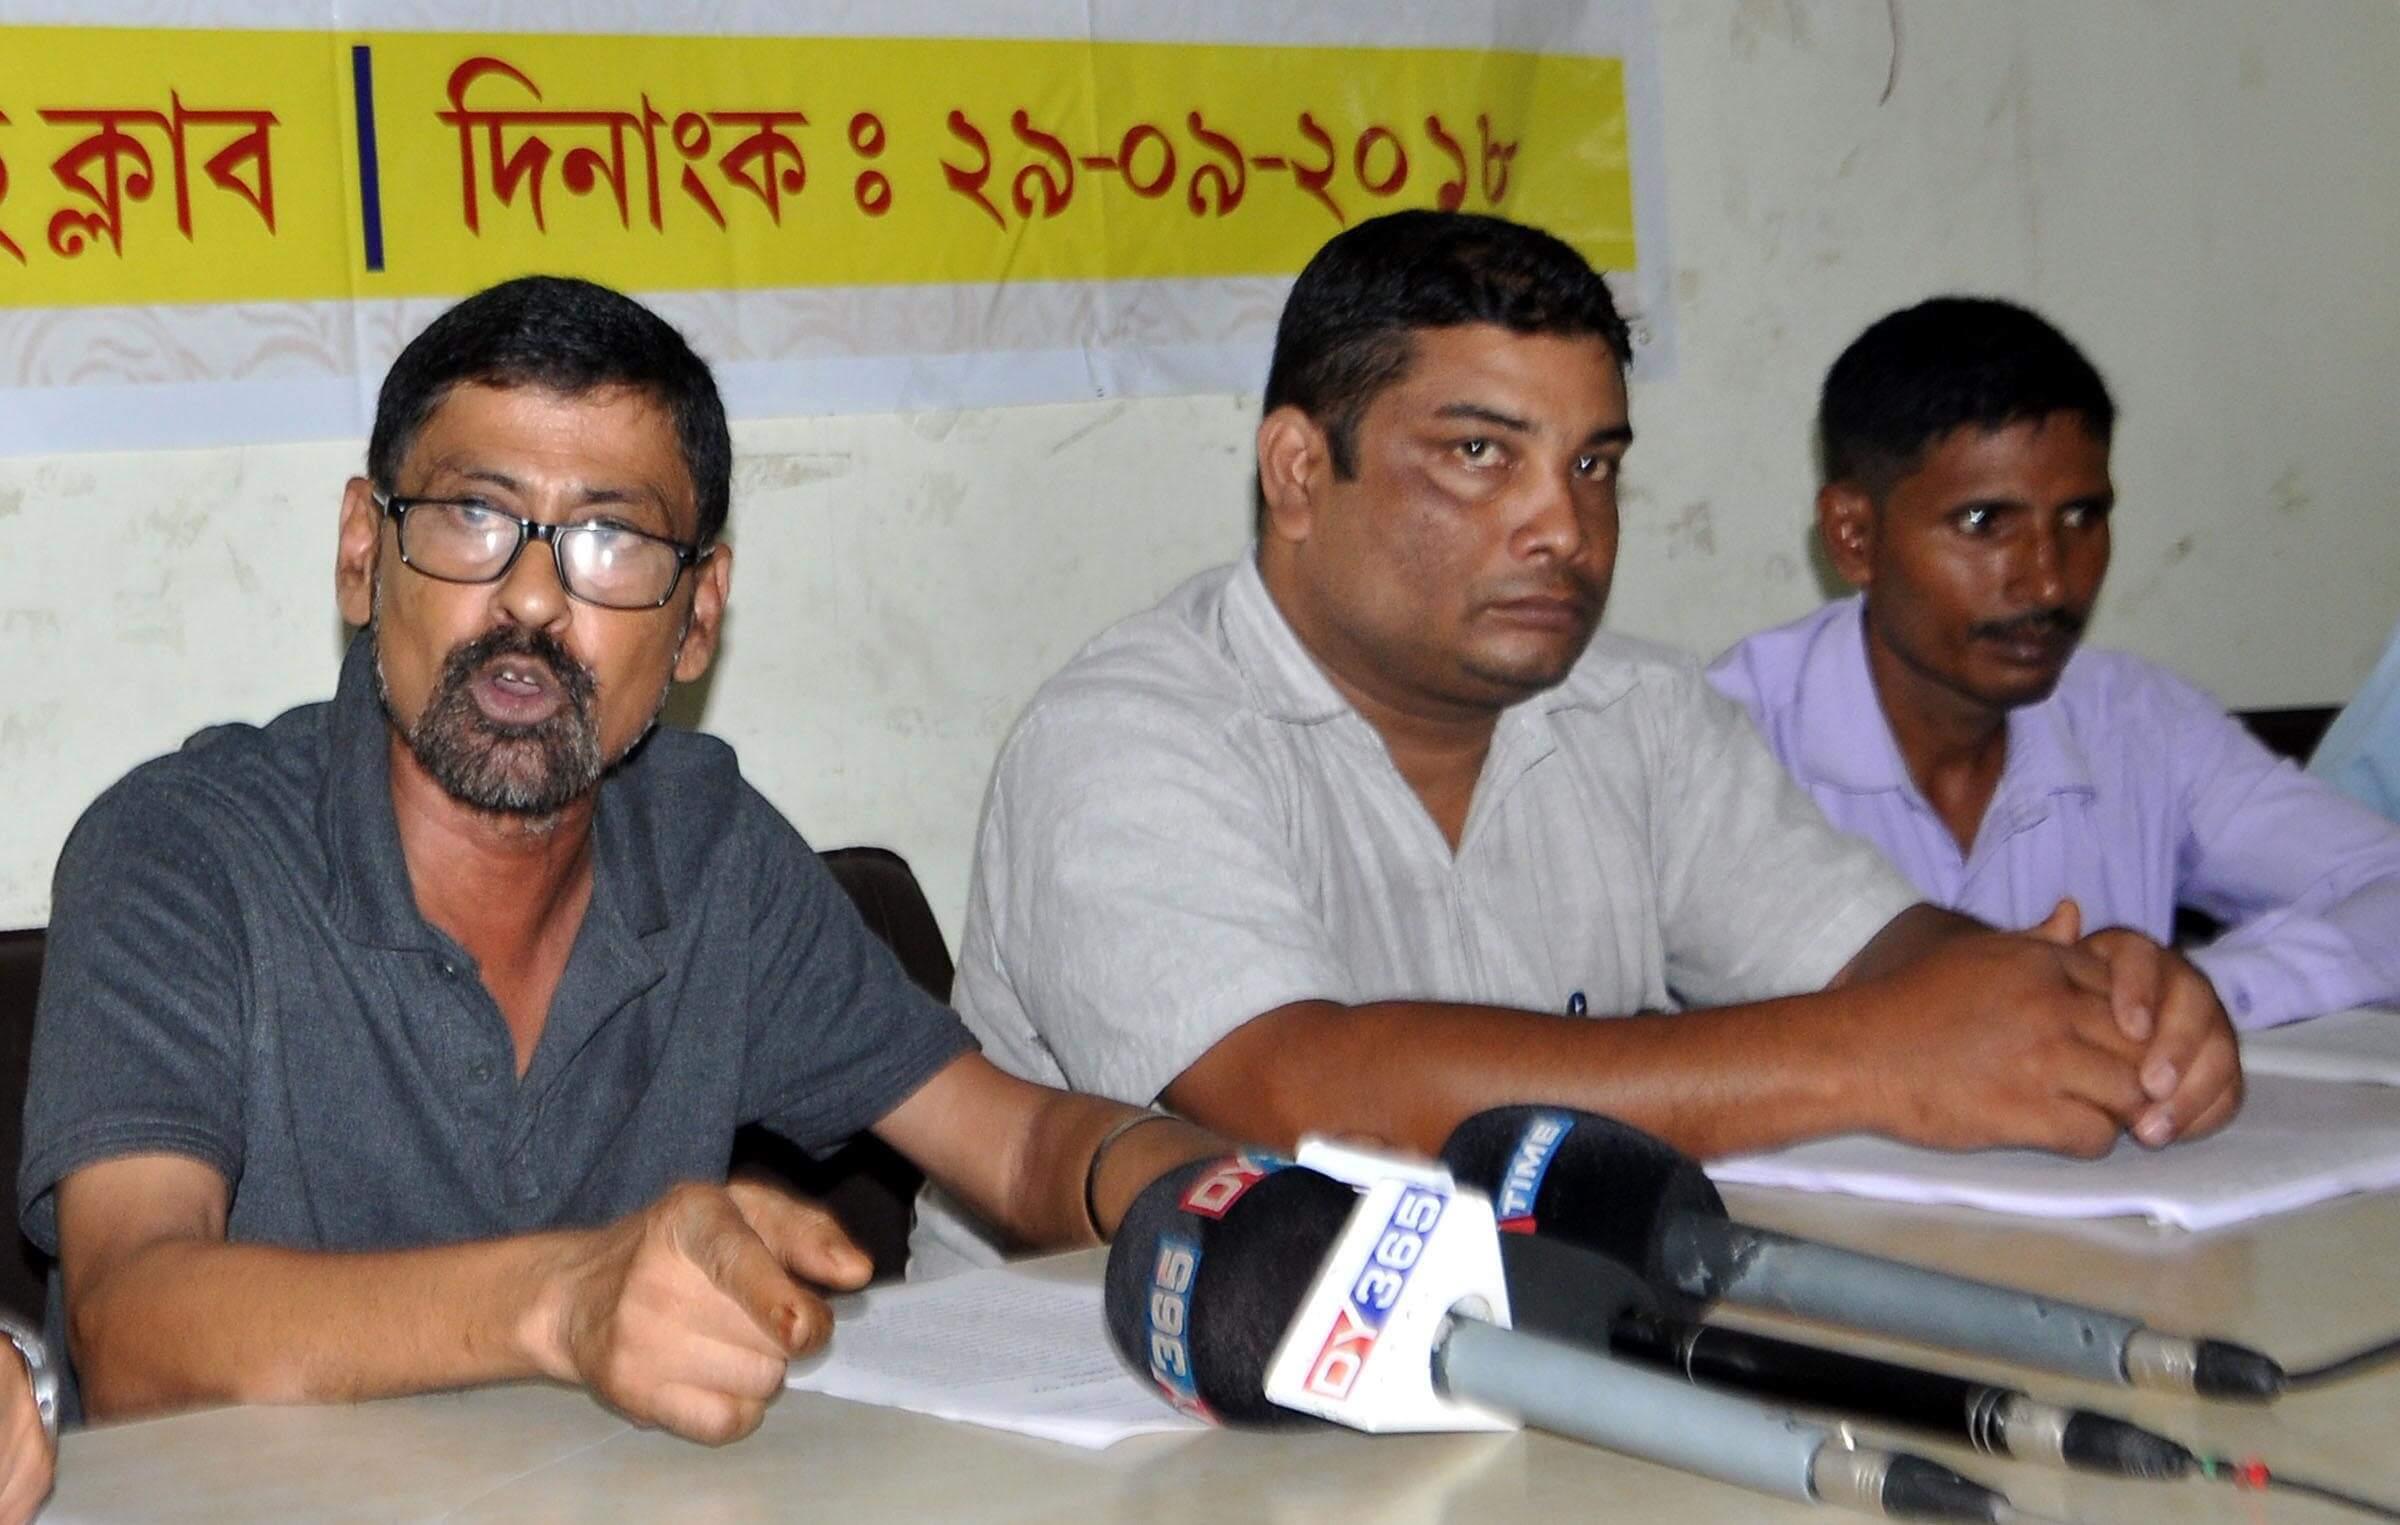 Dispur's Apathy on Land Reform Frustrating Residents: Brihattar Guwahati Unnayan Samiti Aikya Manch